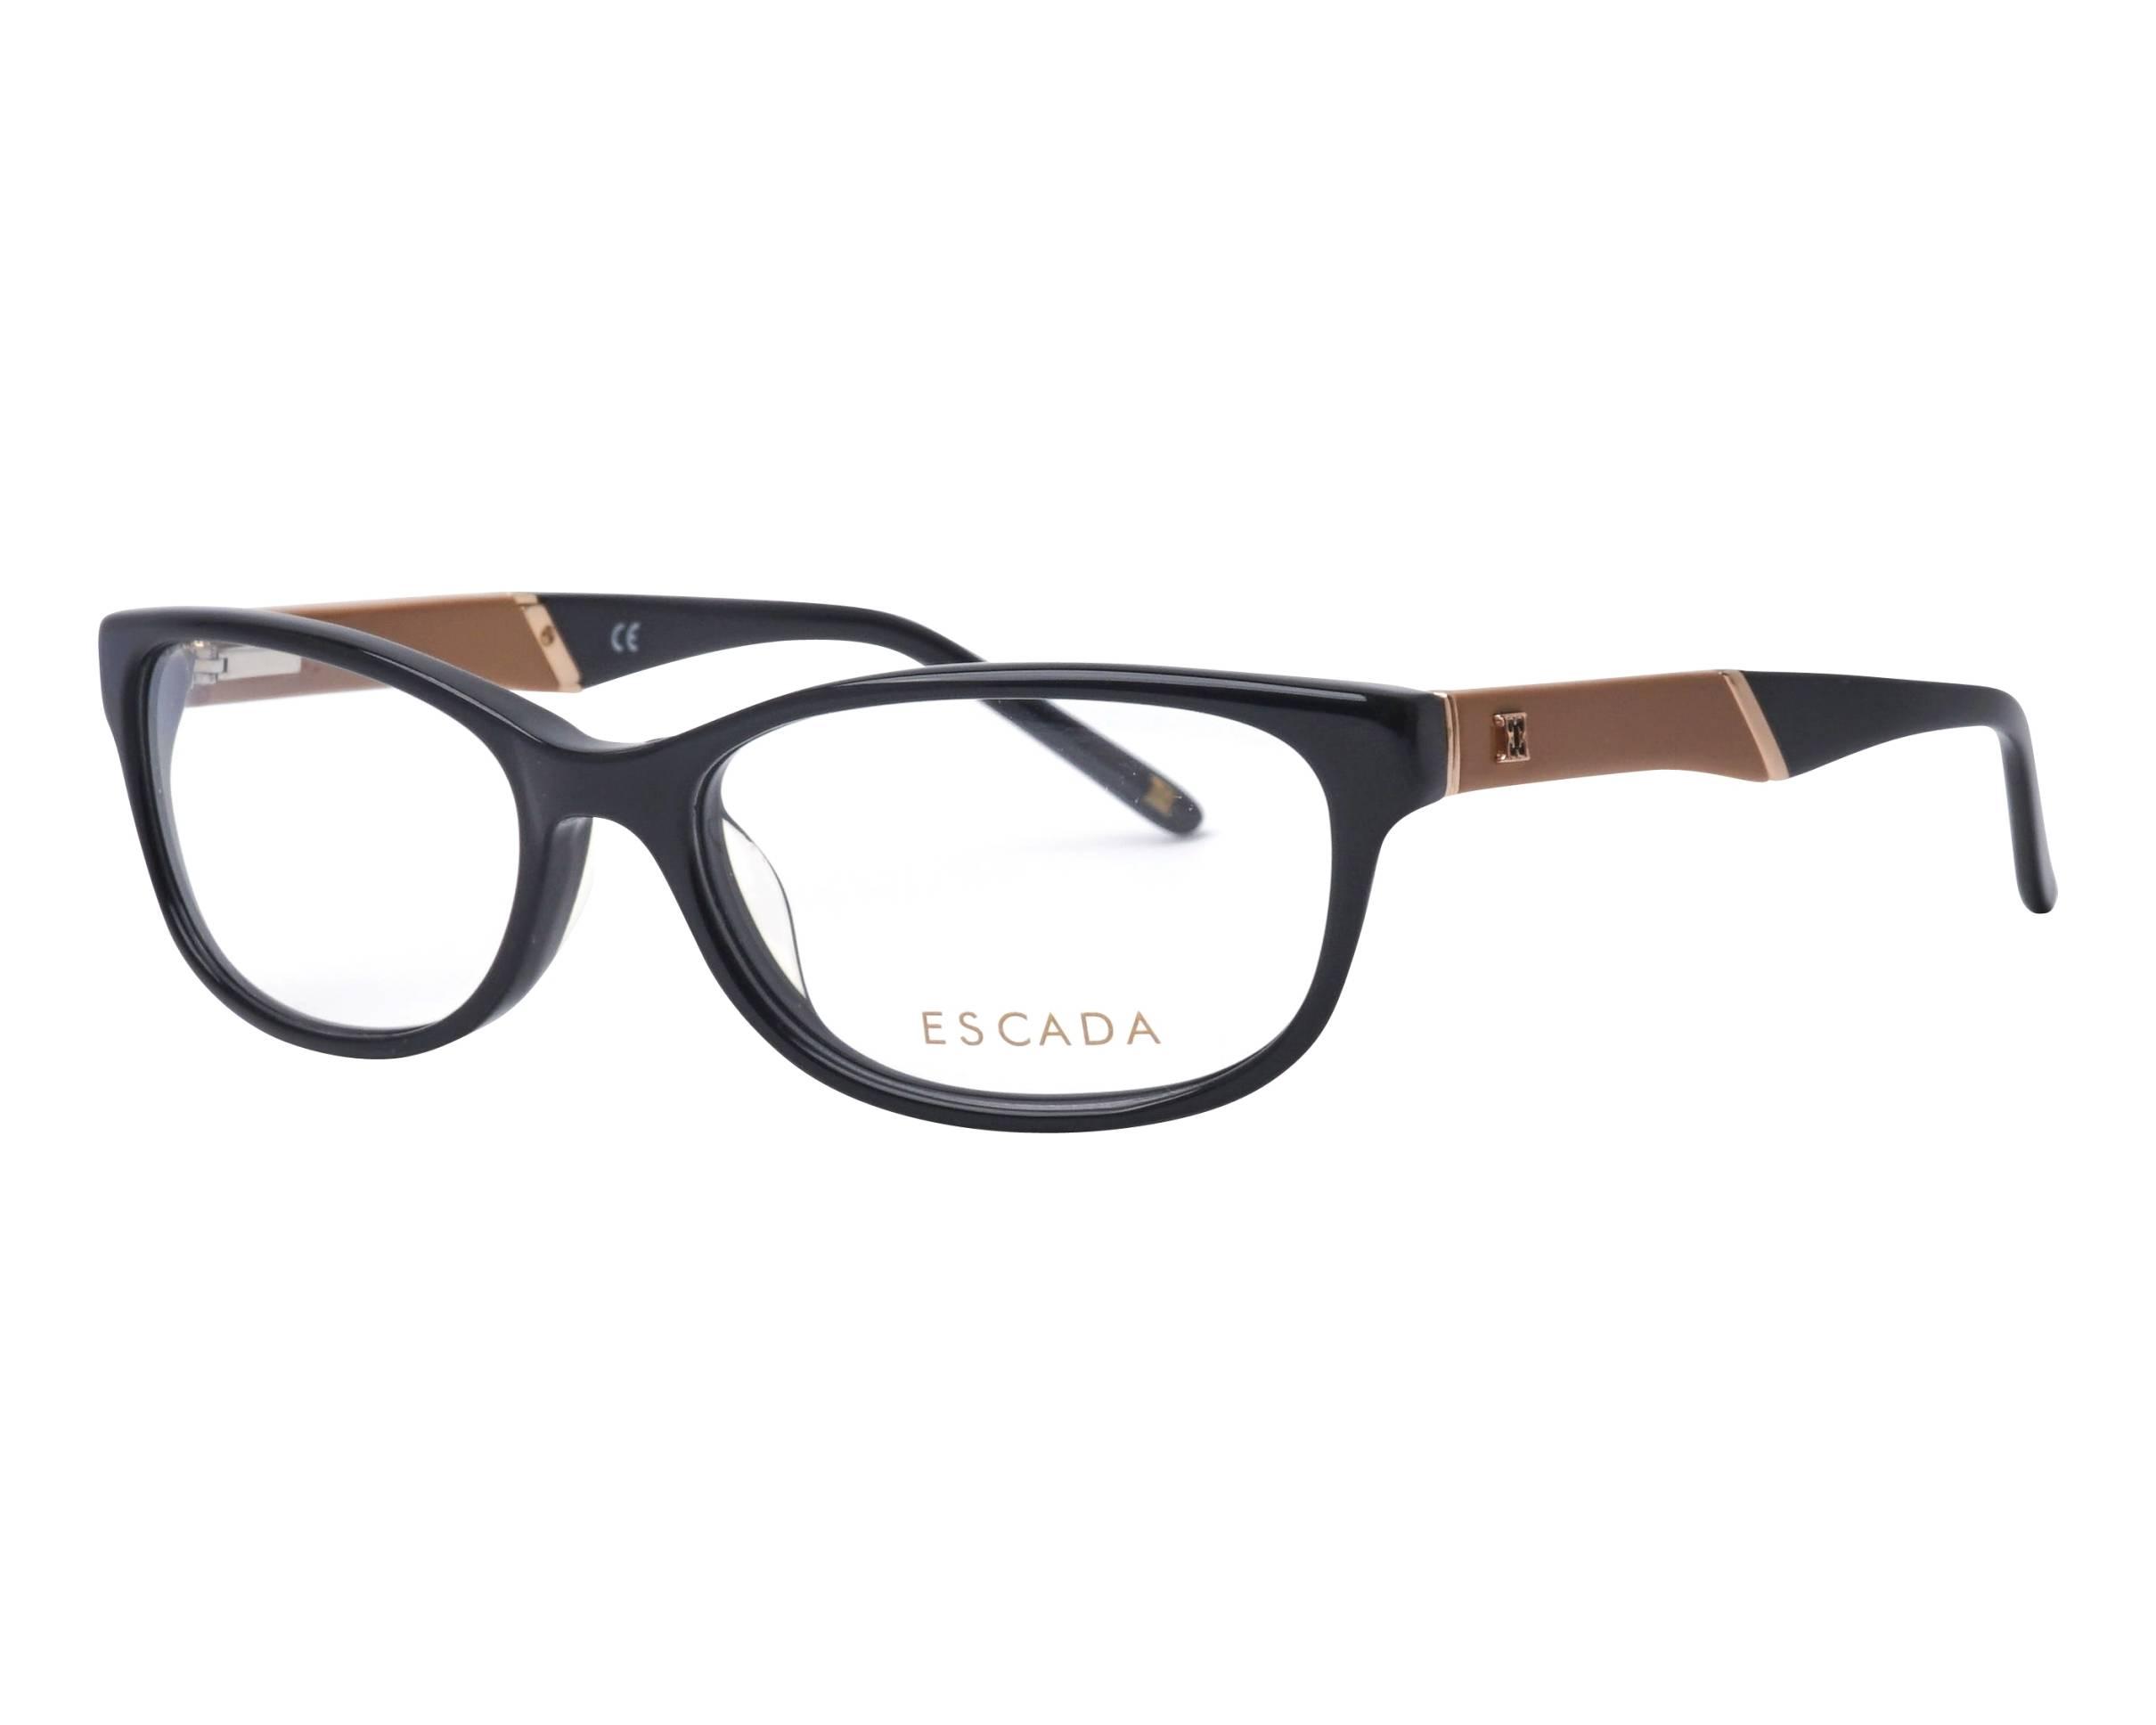 40584caa2b Gafas Graduadas Escada VES-208 0700 53-16 Negra Beige vista de perfil